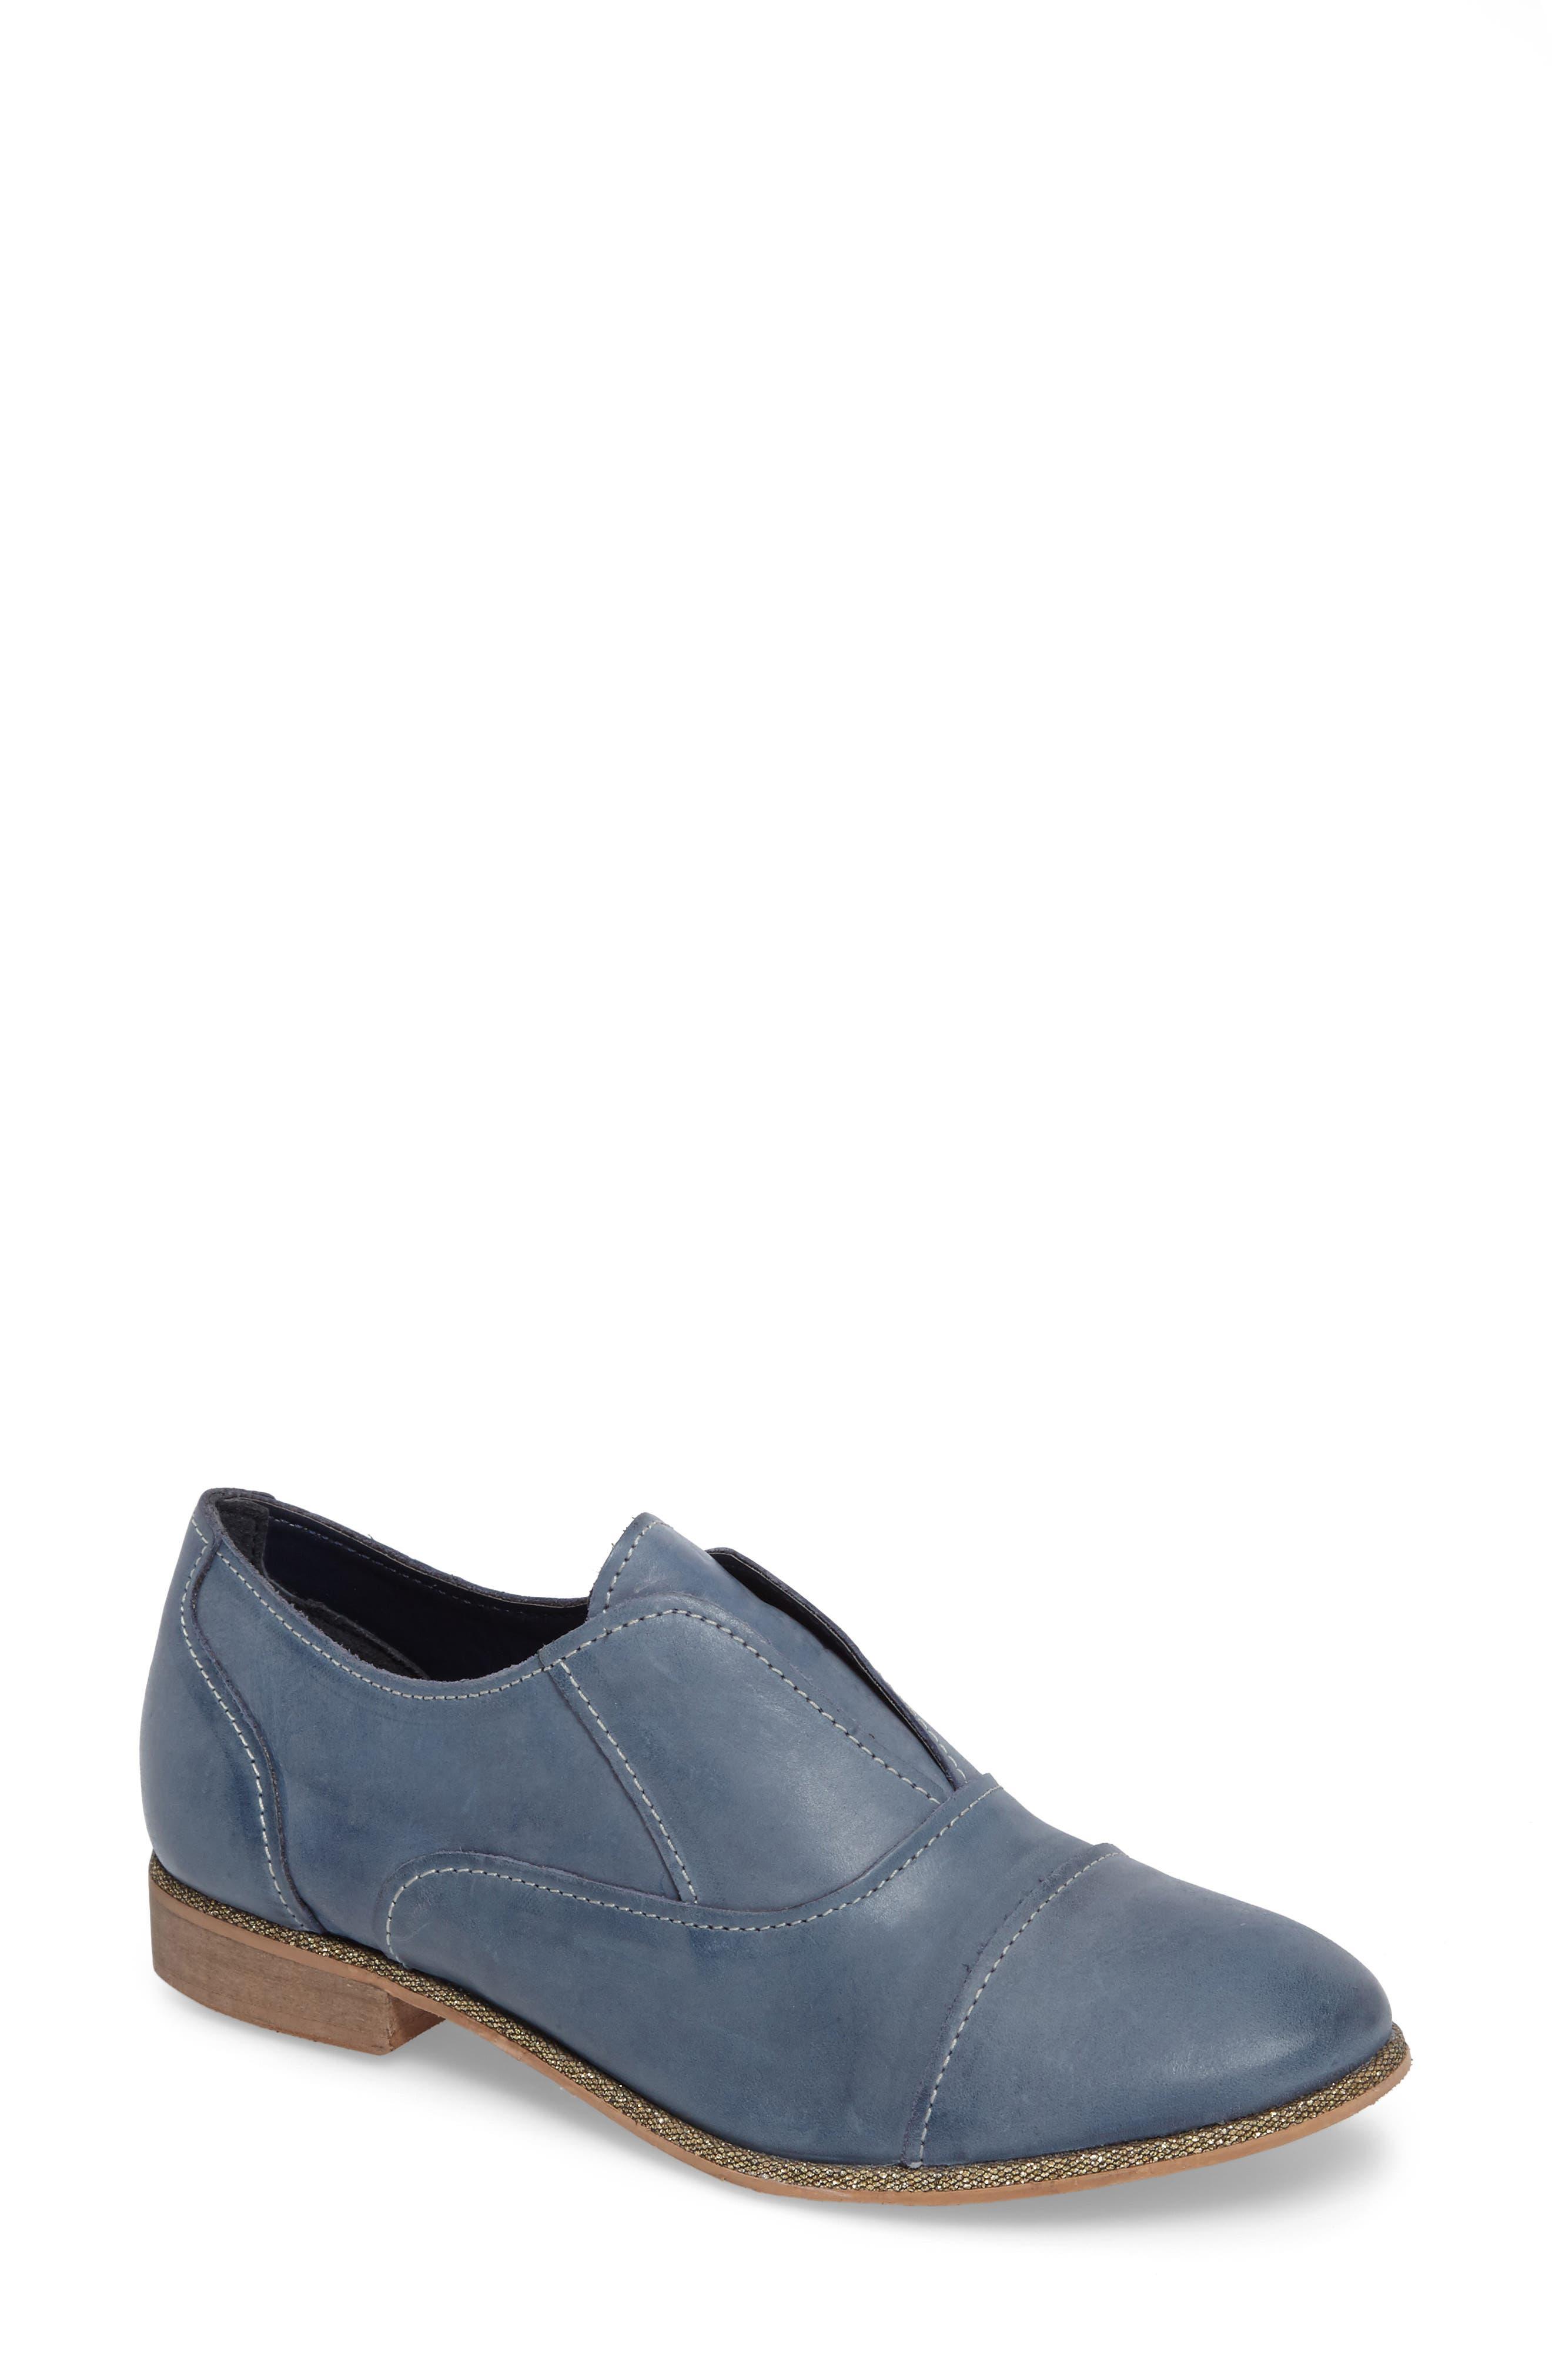 Slip Knot Loafer,                         Main,                         color, Blue Leather